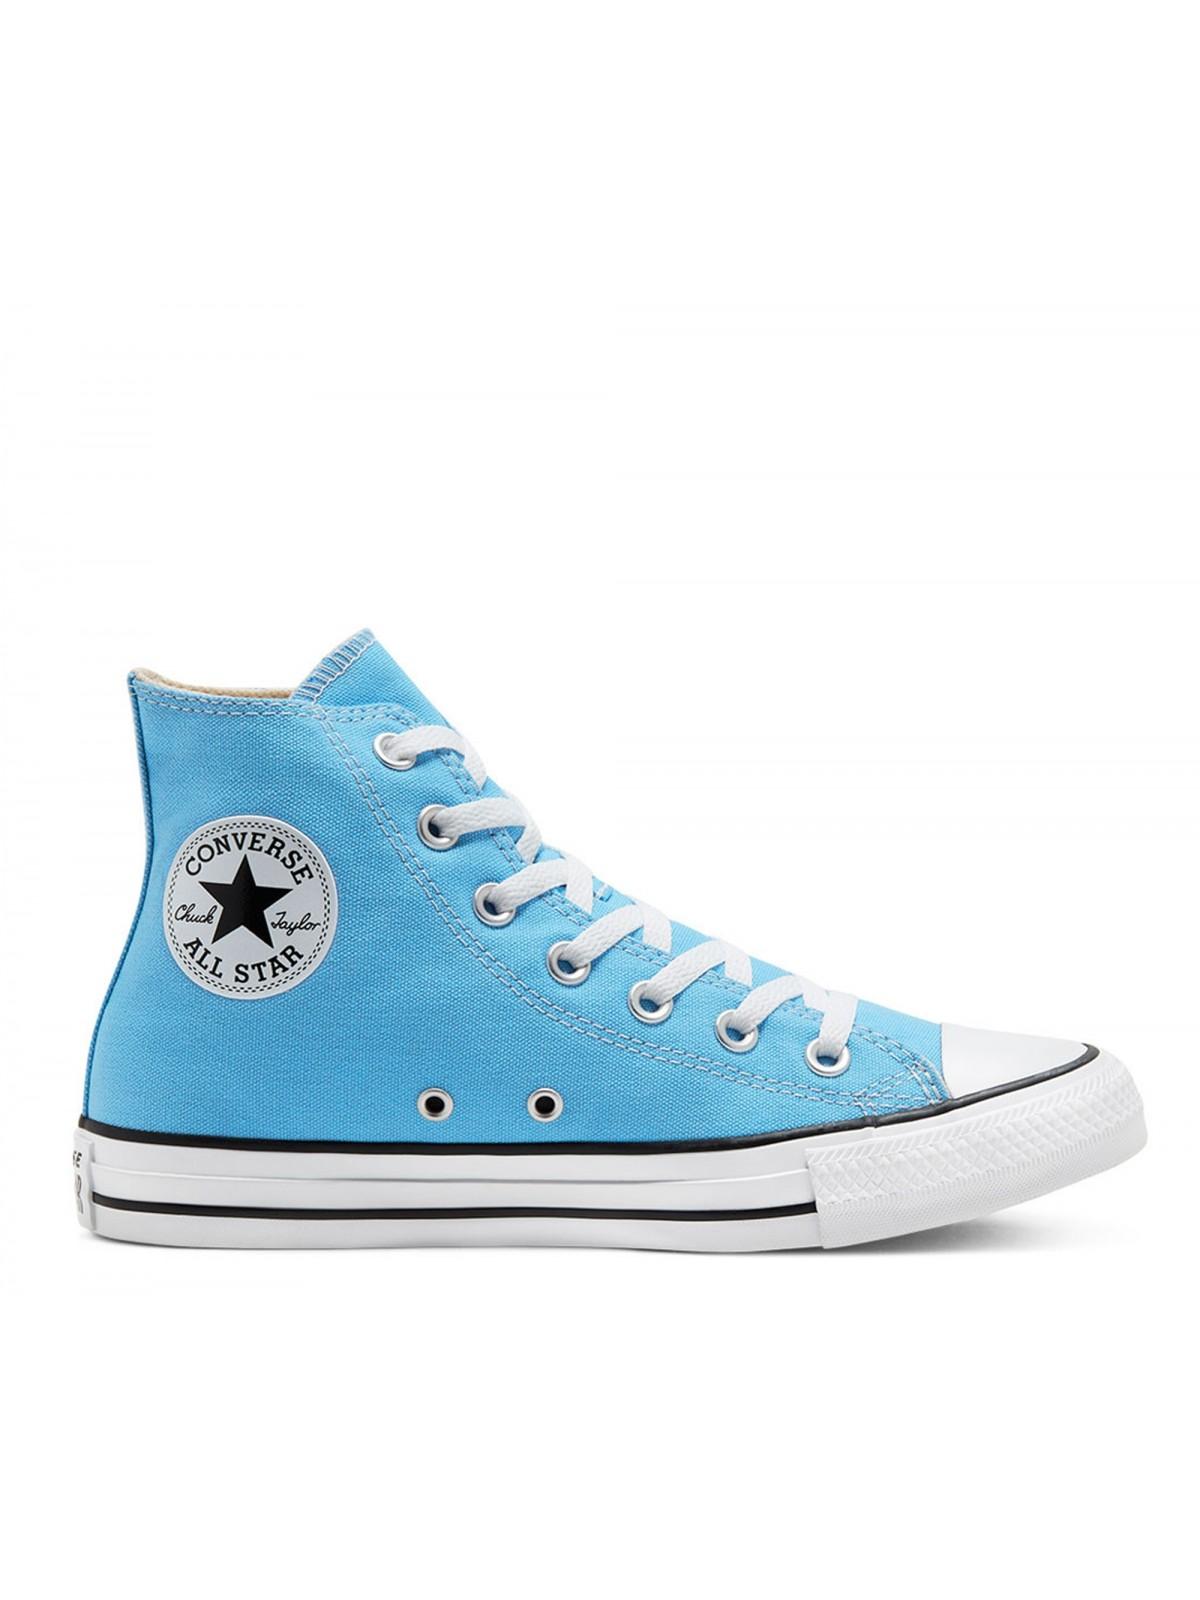 Converse Chuck Taylor all star toile bleu littoral